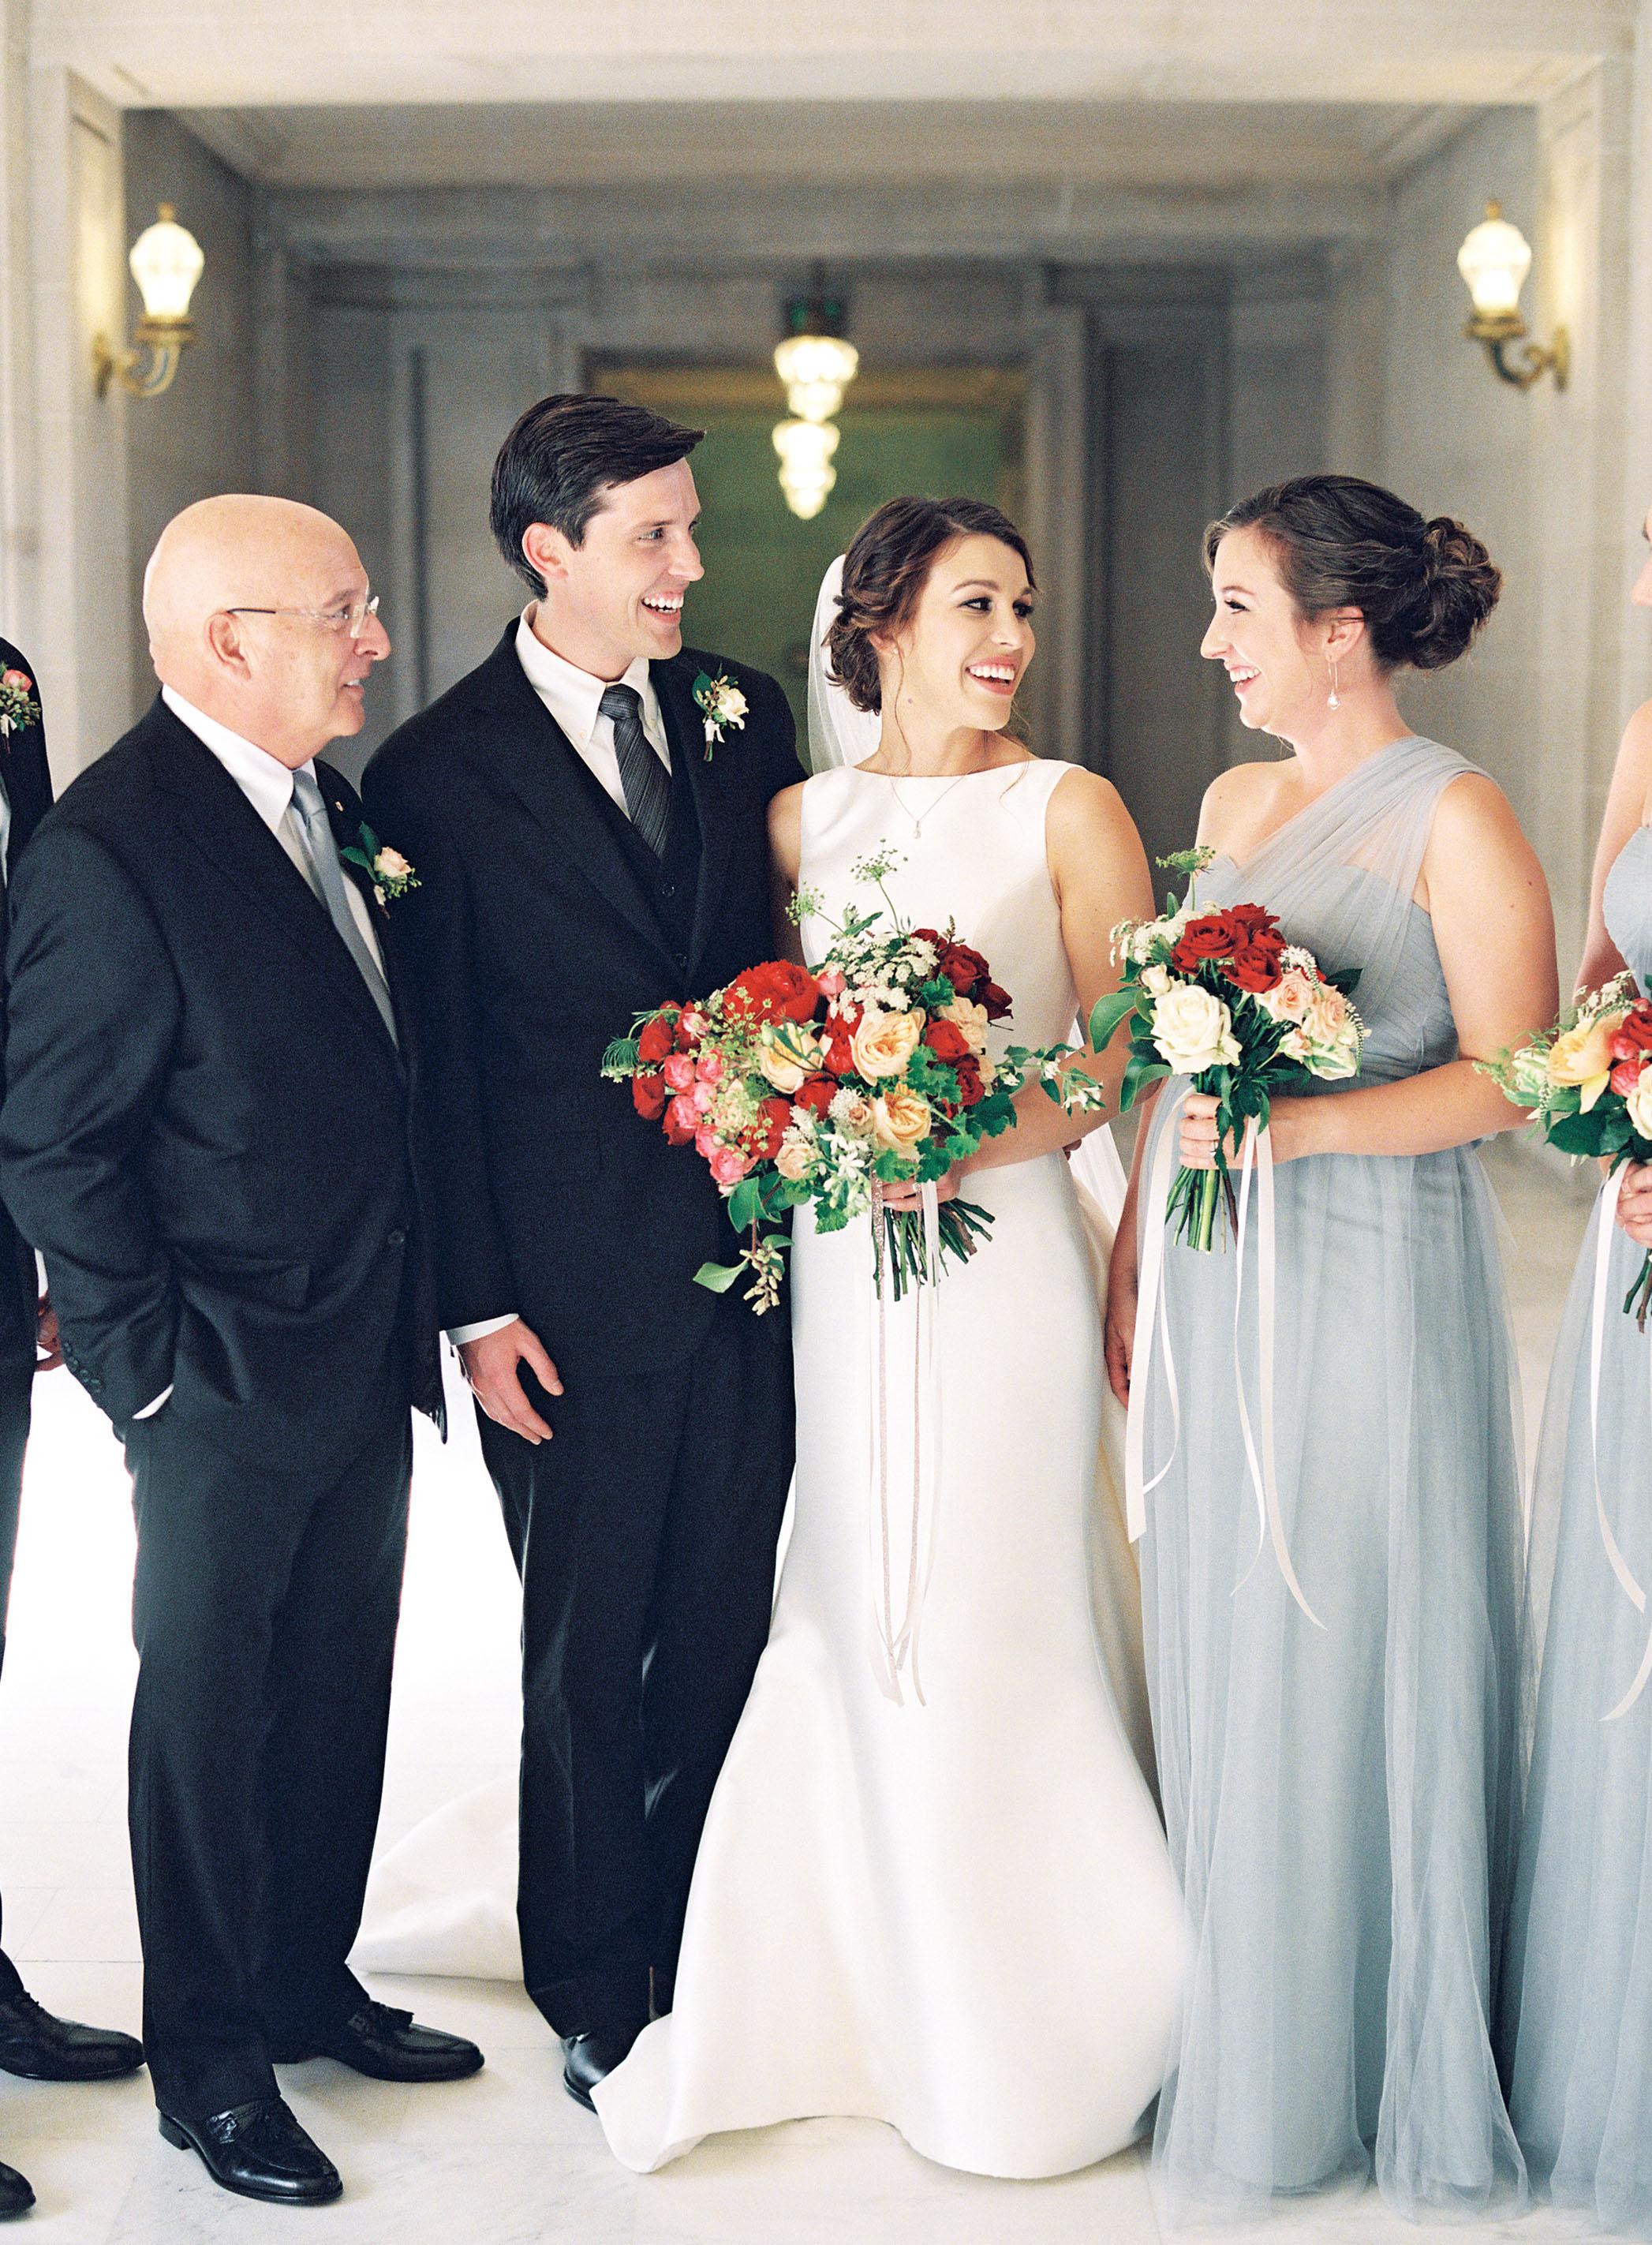 Meghan Mehan Photography - California Wedding Photographer | San Francisco City Hall Wedding 070.jpg